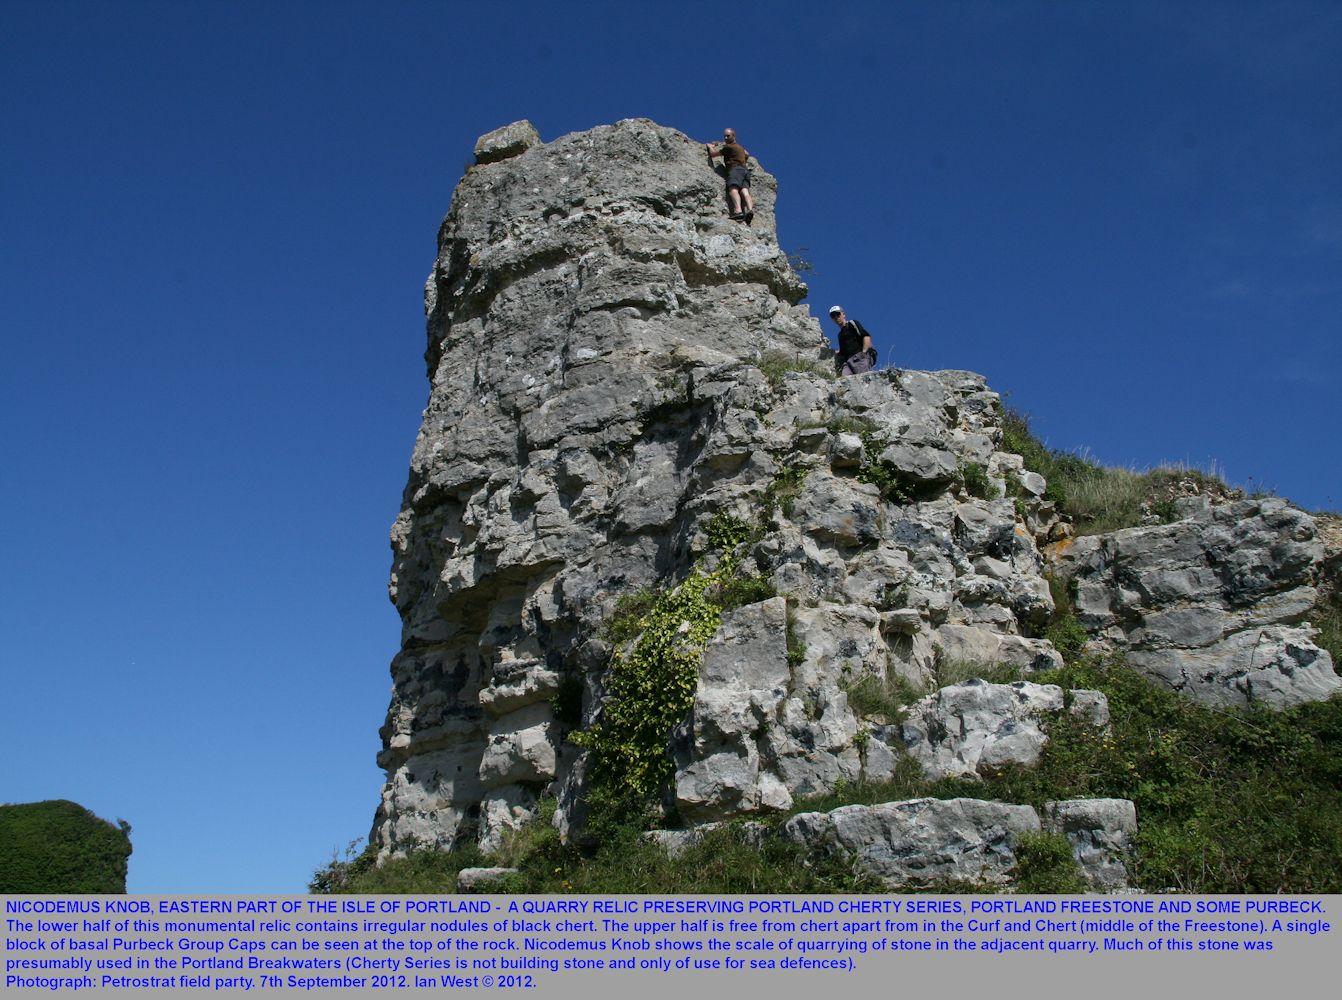 Climbing Nicodemus Knob, eastern Isle of Portland, Dorset, Petrostrat field trip, 7th September 2012